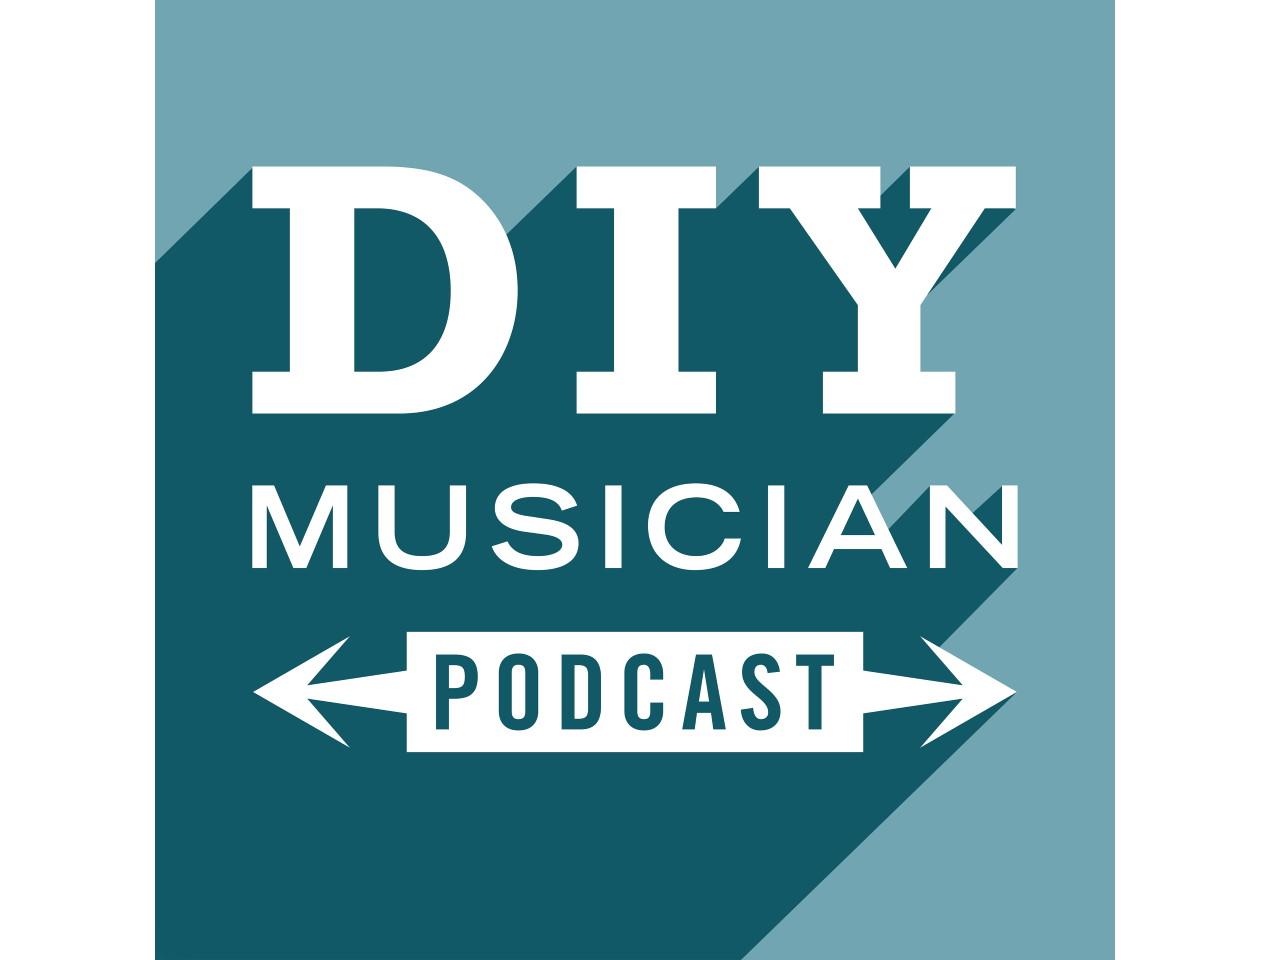 CDBaby DIY Musician Podcast